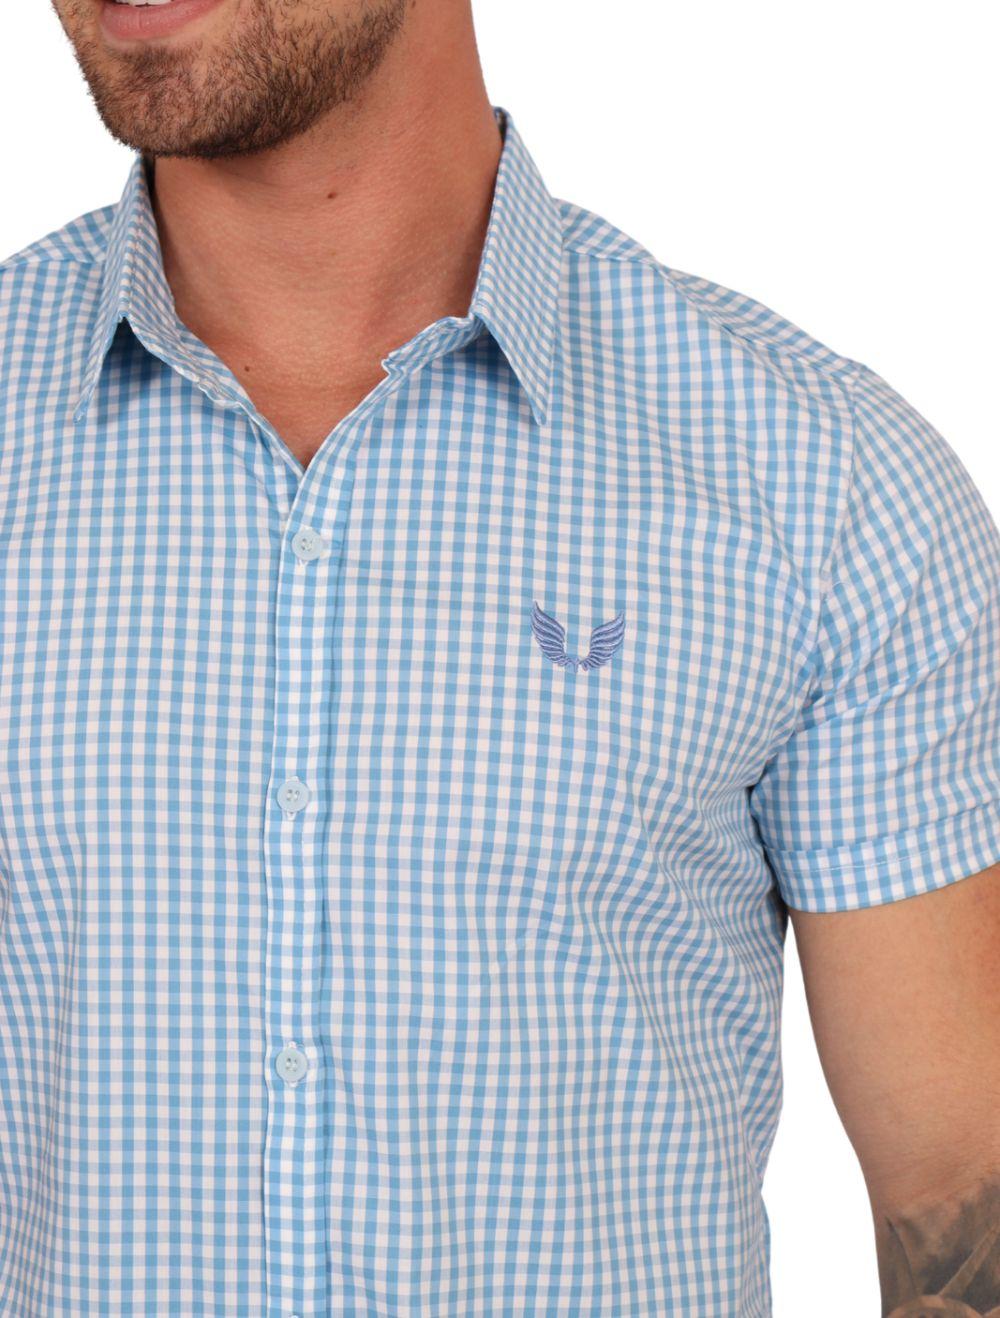 Camisa Masculina Manga Curta Xadrez Azul